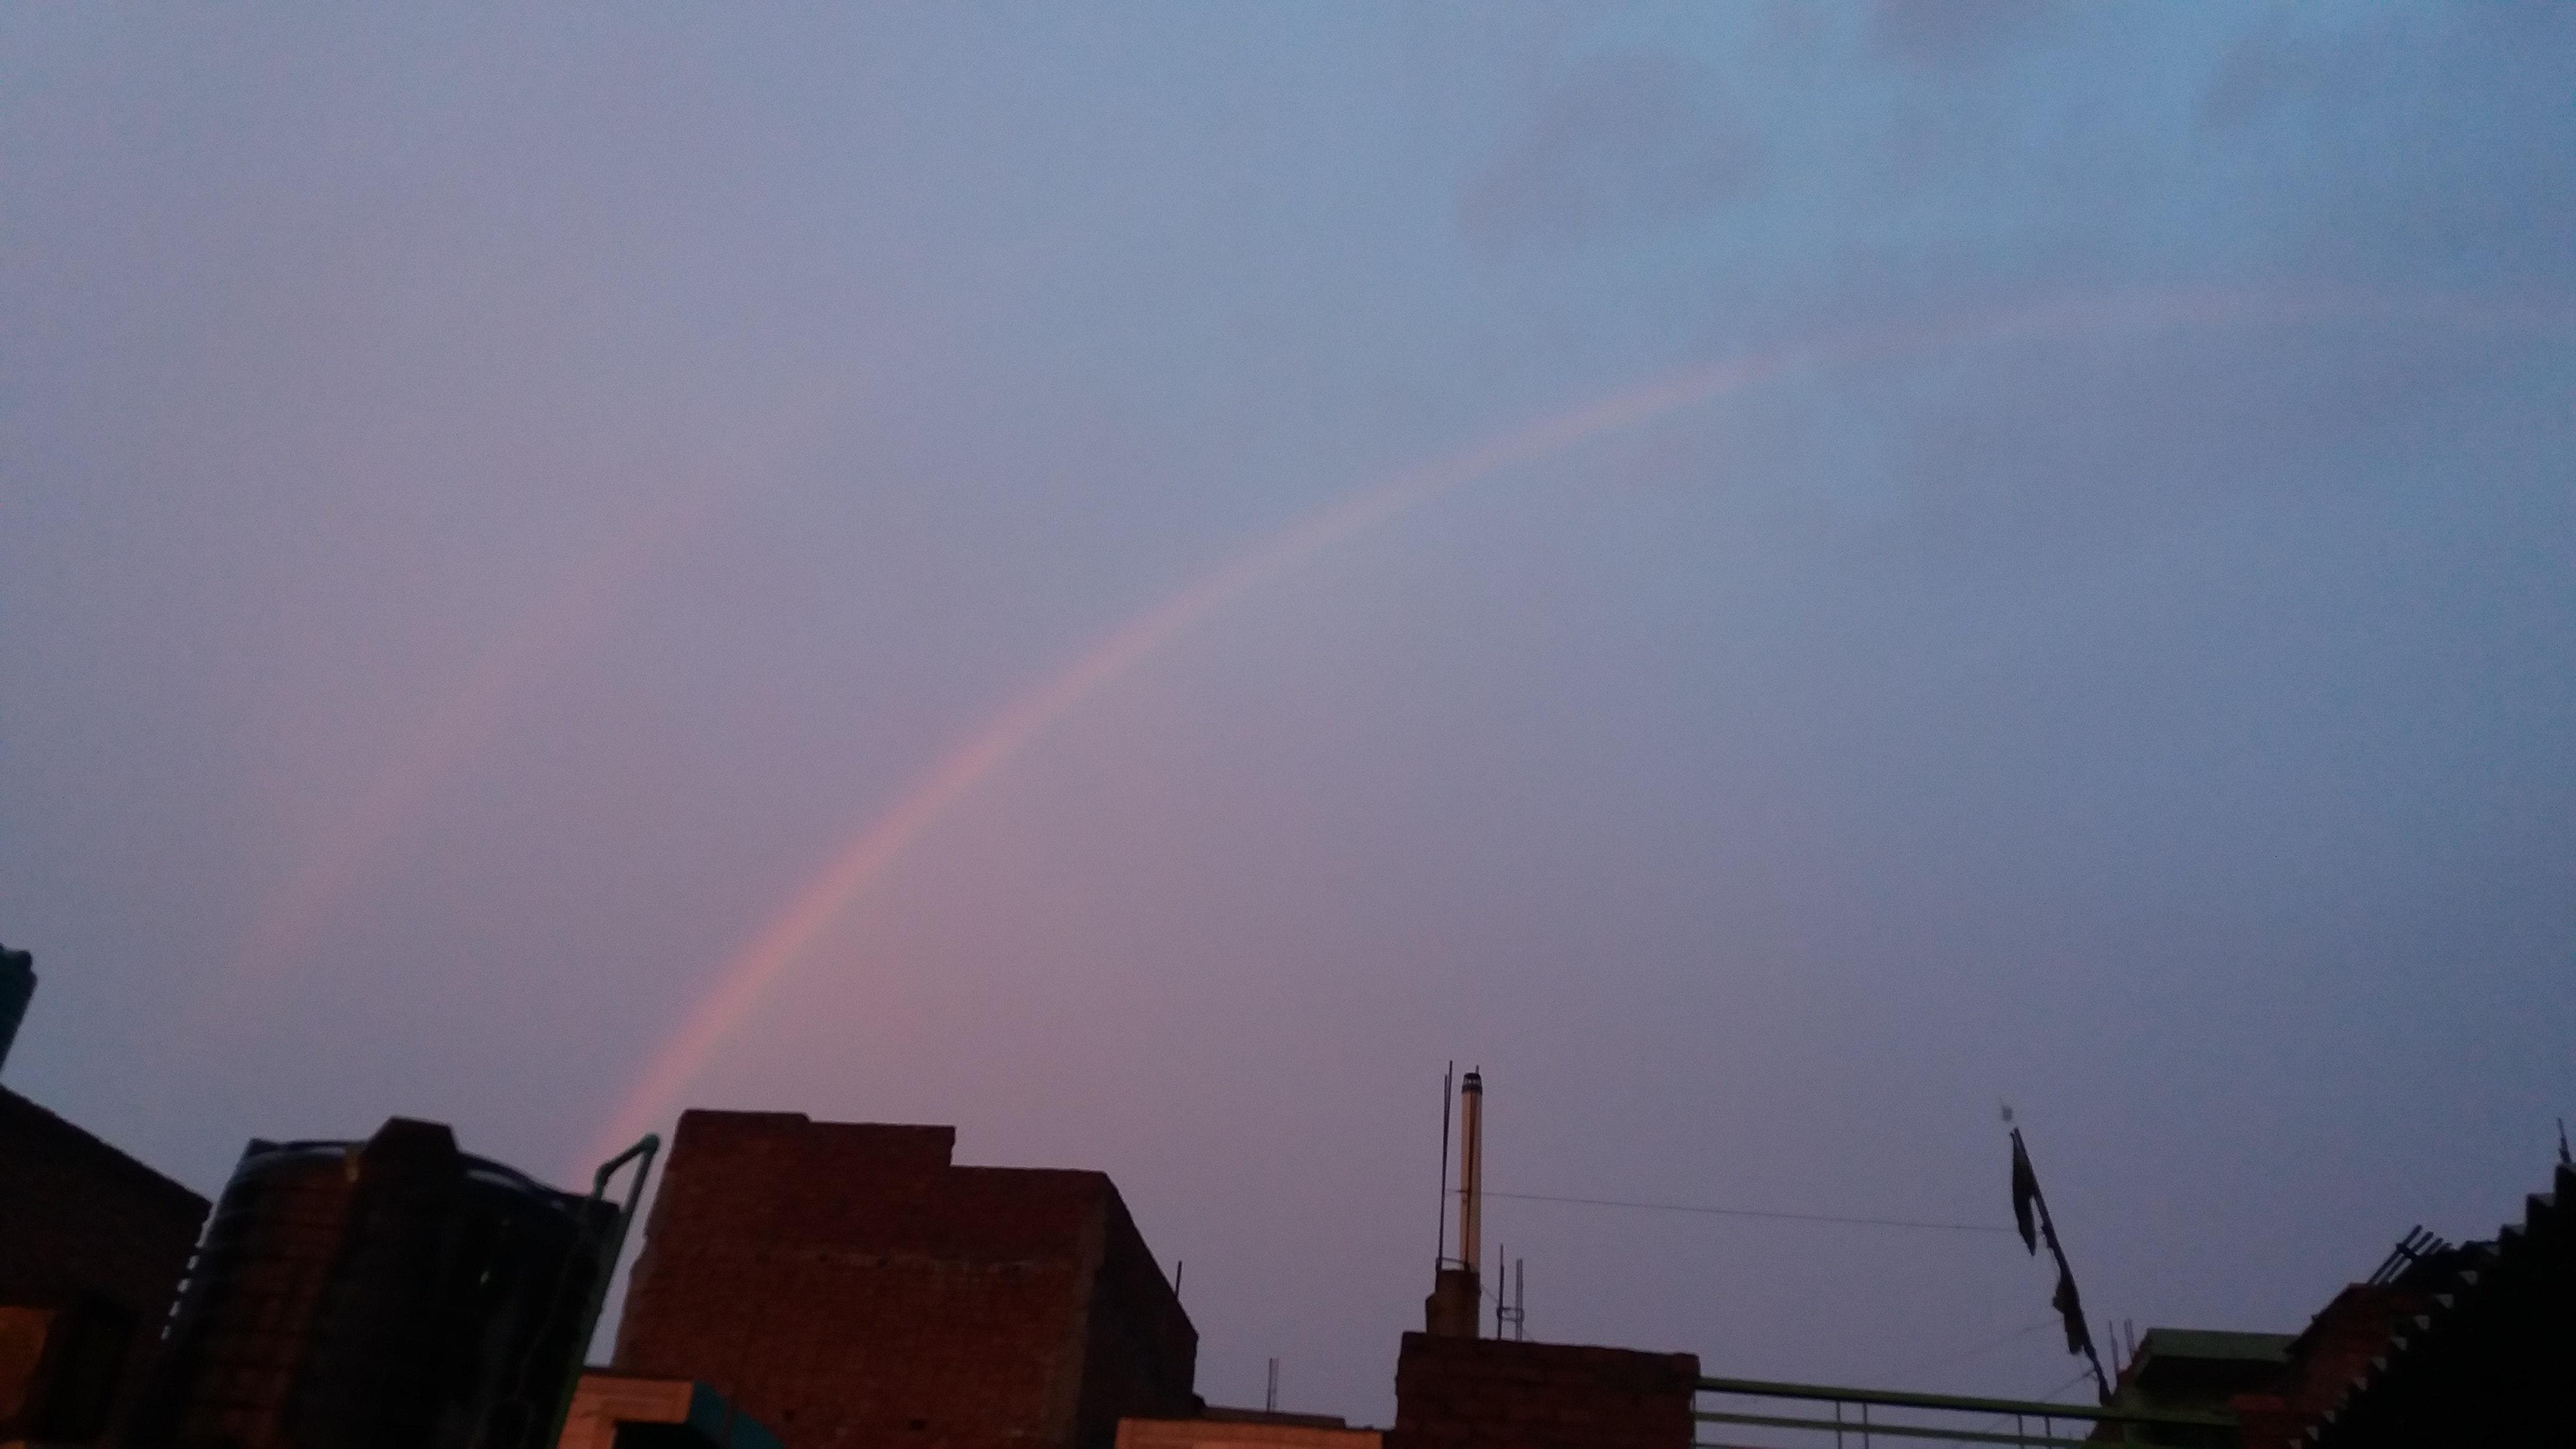 Free stock photo of Amazing light, rainbow, sky